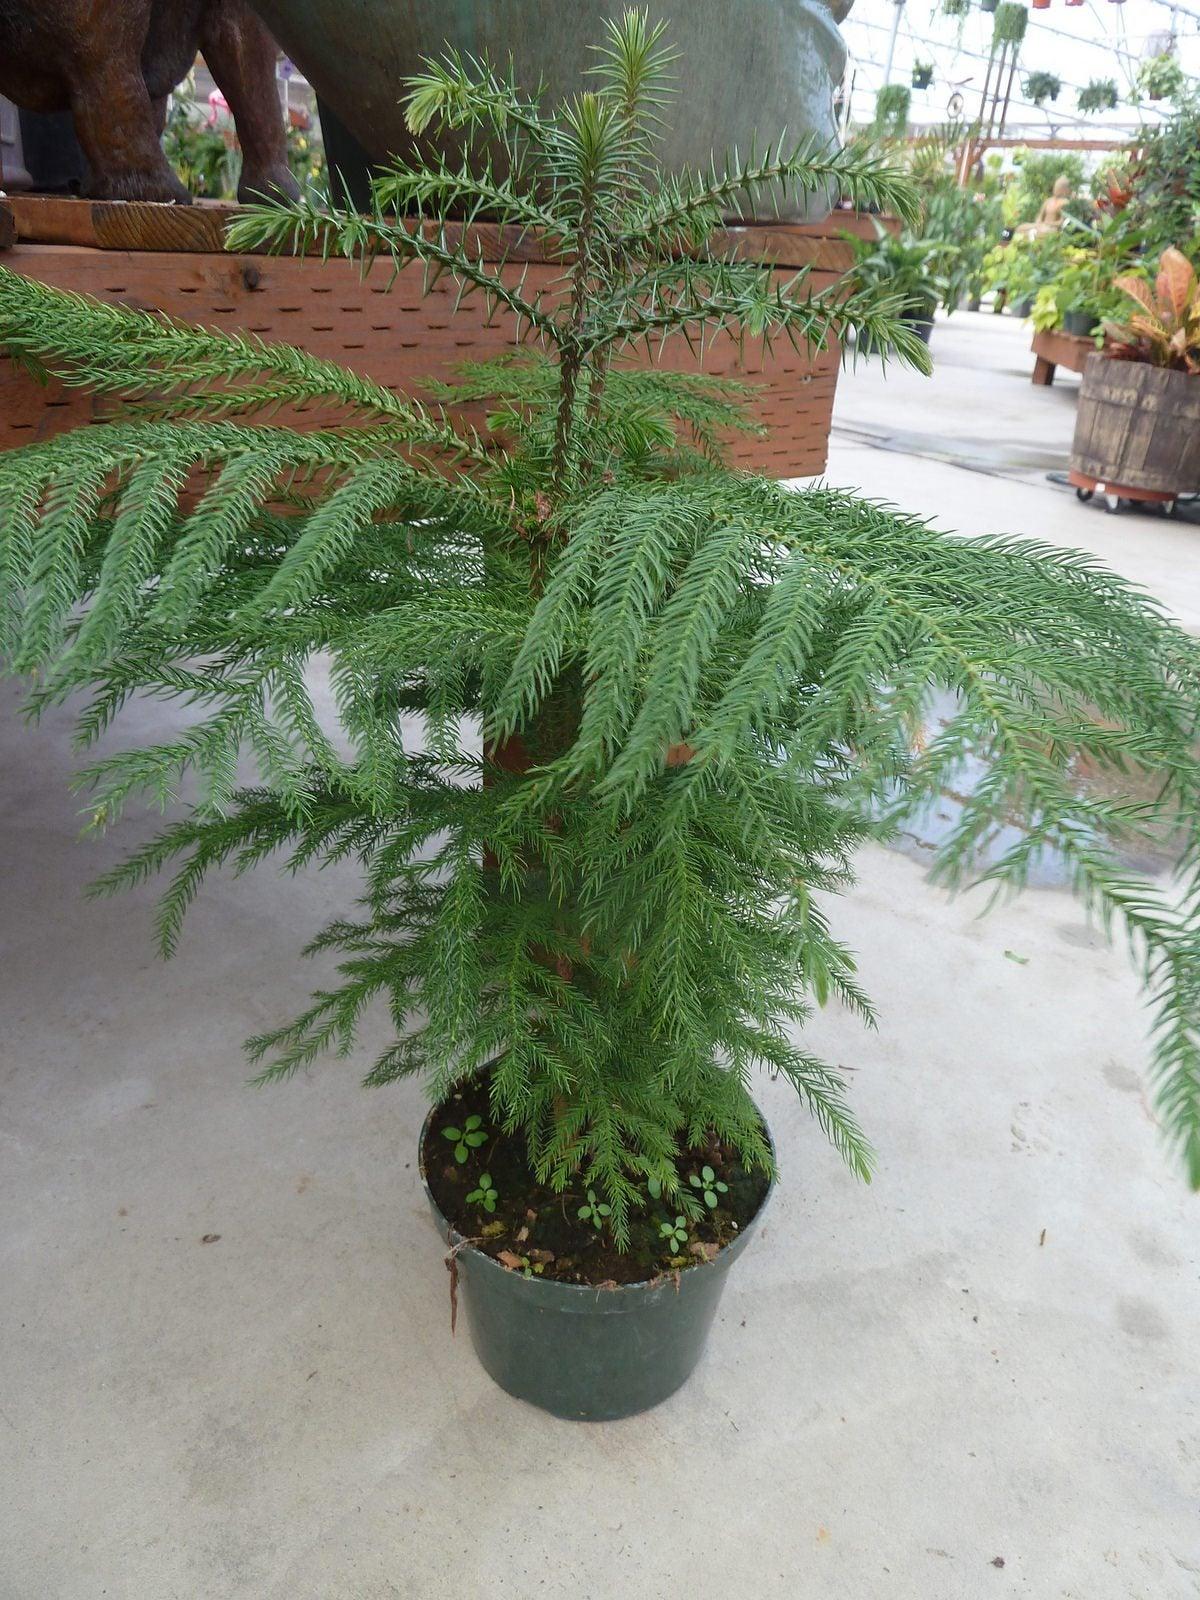 Pruning Of Norfolk Island Pine Trees - Should You Prune A Norfolk ...